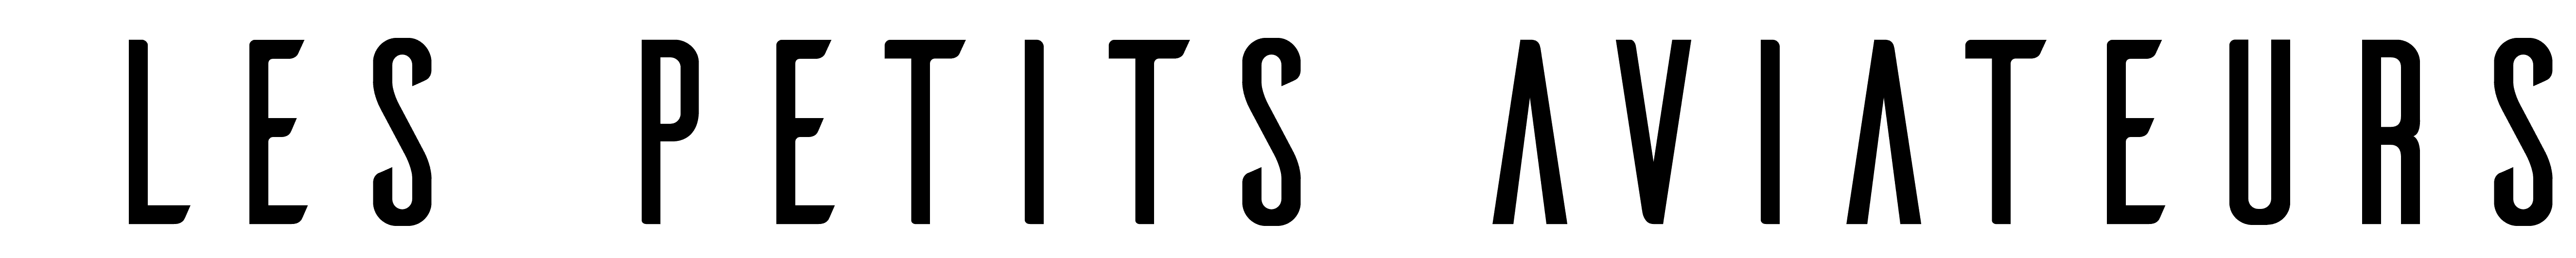 logo du site lespetitsaviateurs.fr